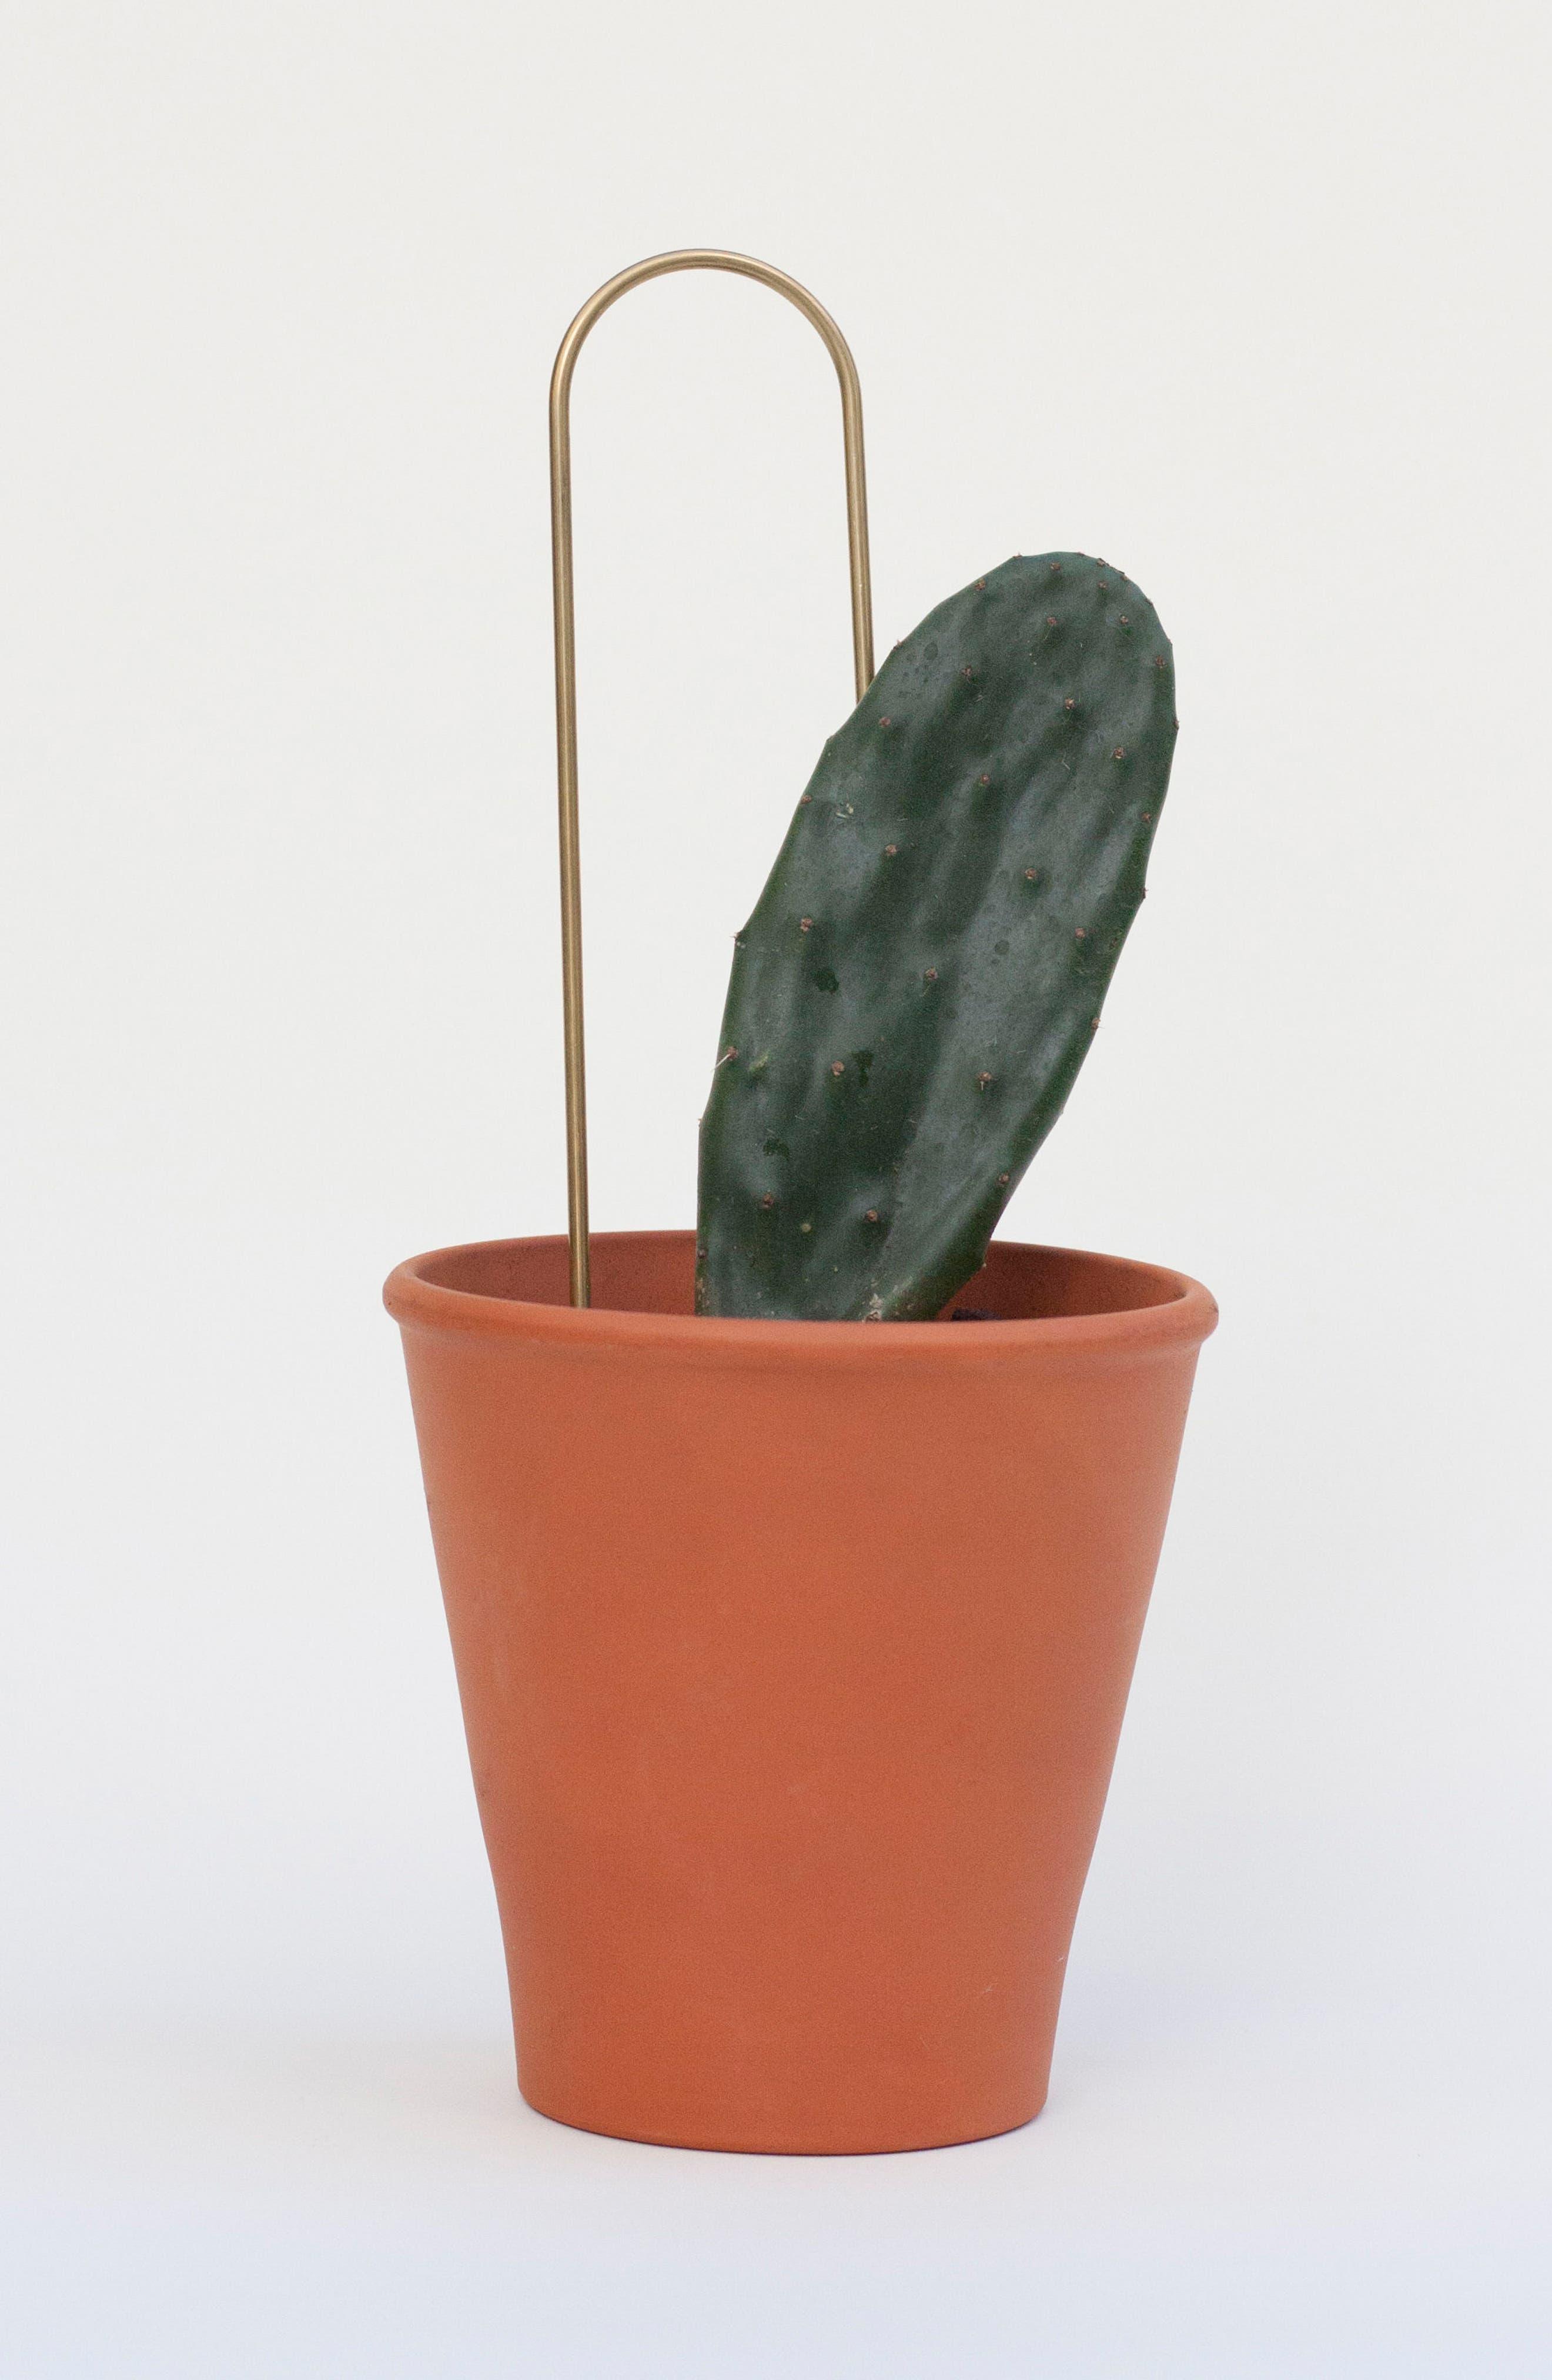 Set of 3 Plant Sticks,                             Alternate thumbnail 12, color,                             BRASS